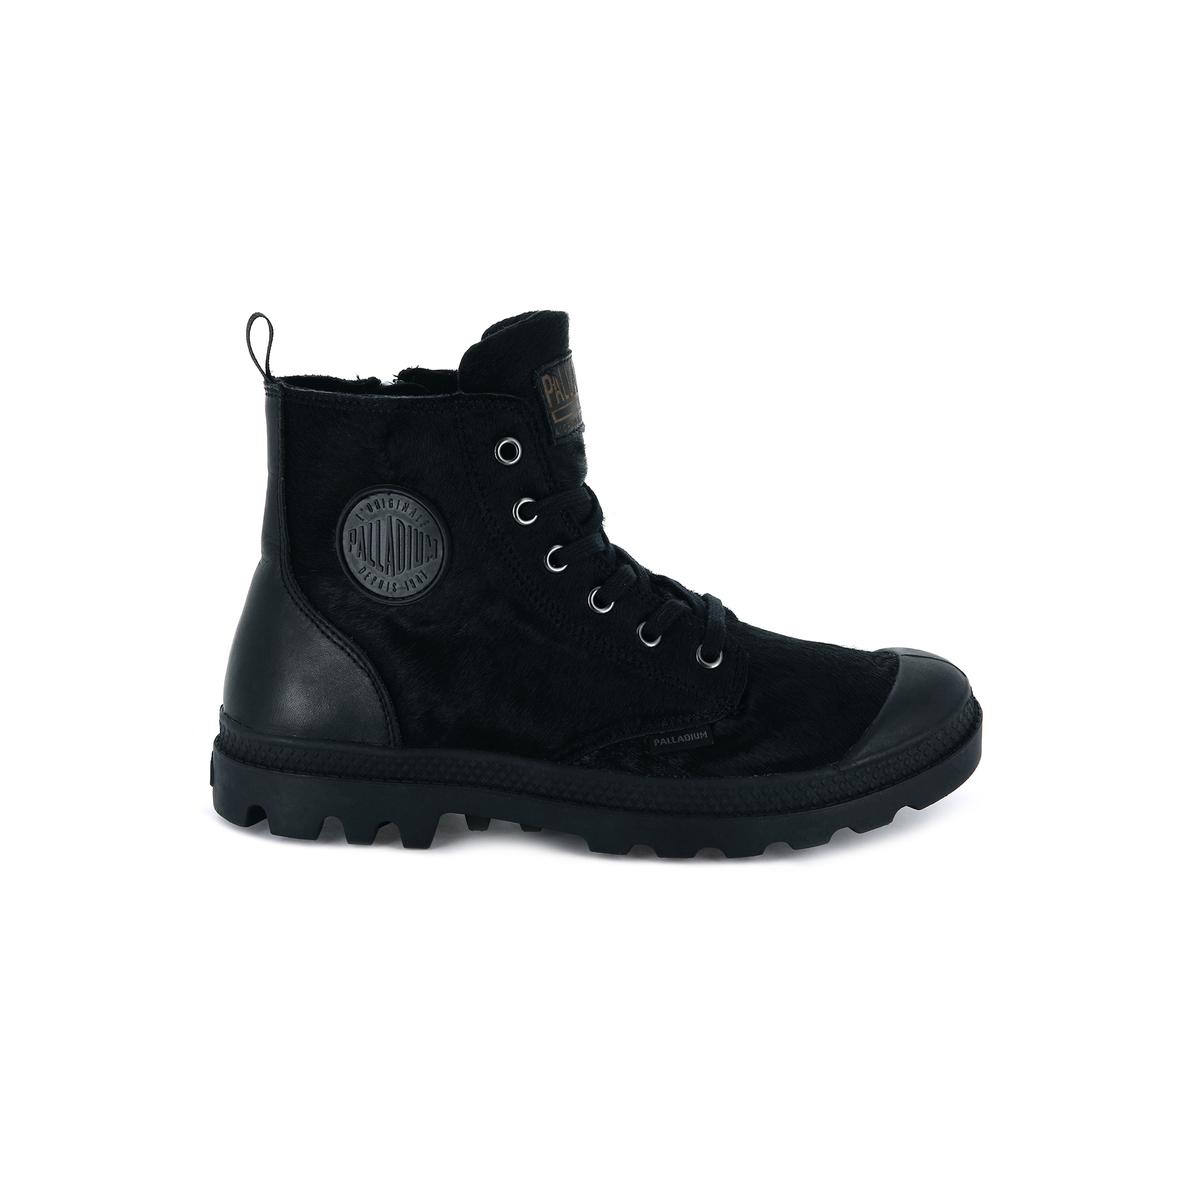 Ботинки кожаные Pampa Hi Zpny ботильоны кожаные pampa hi z wl